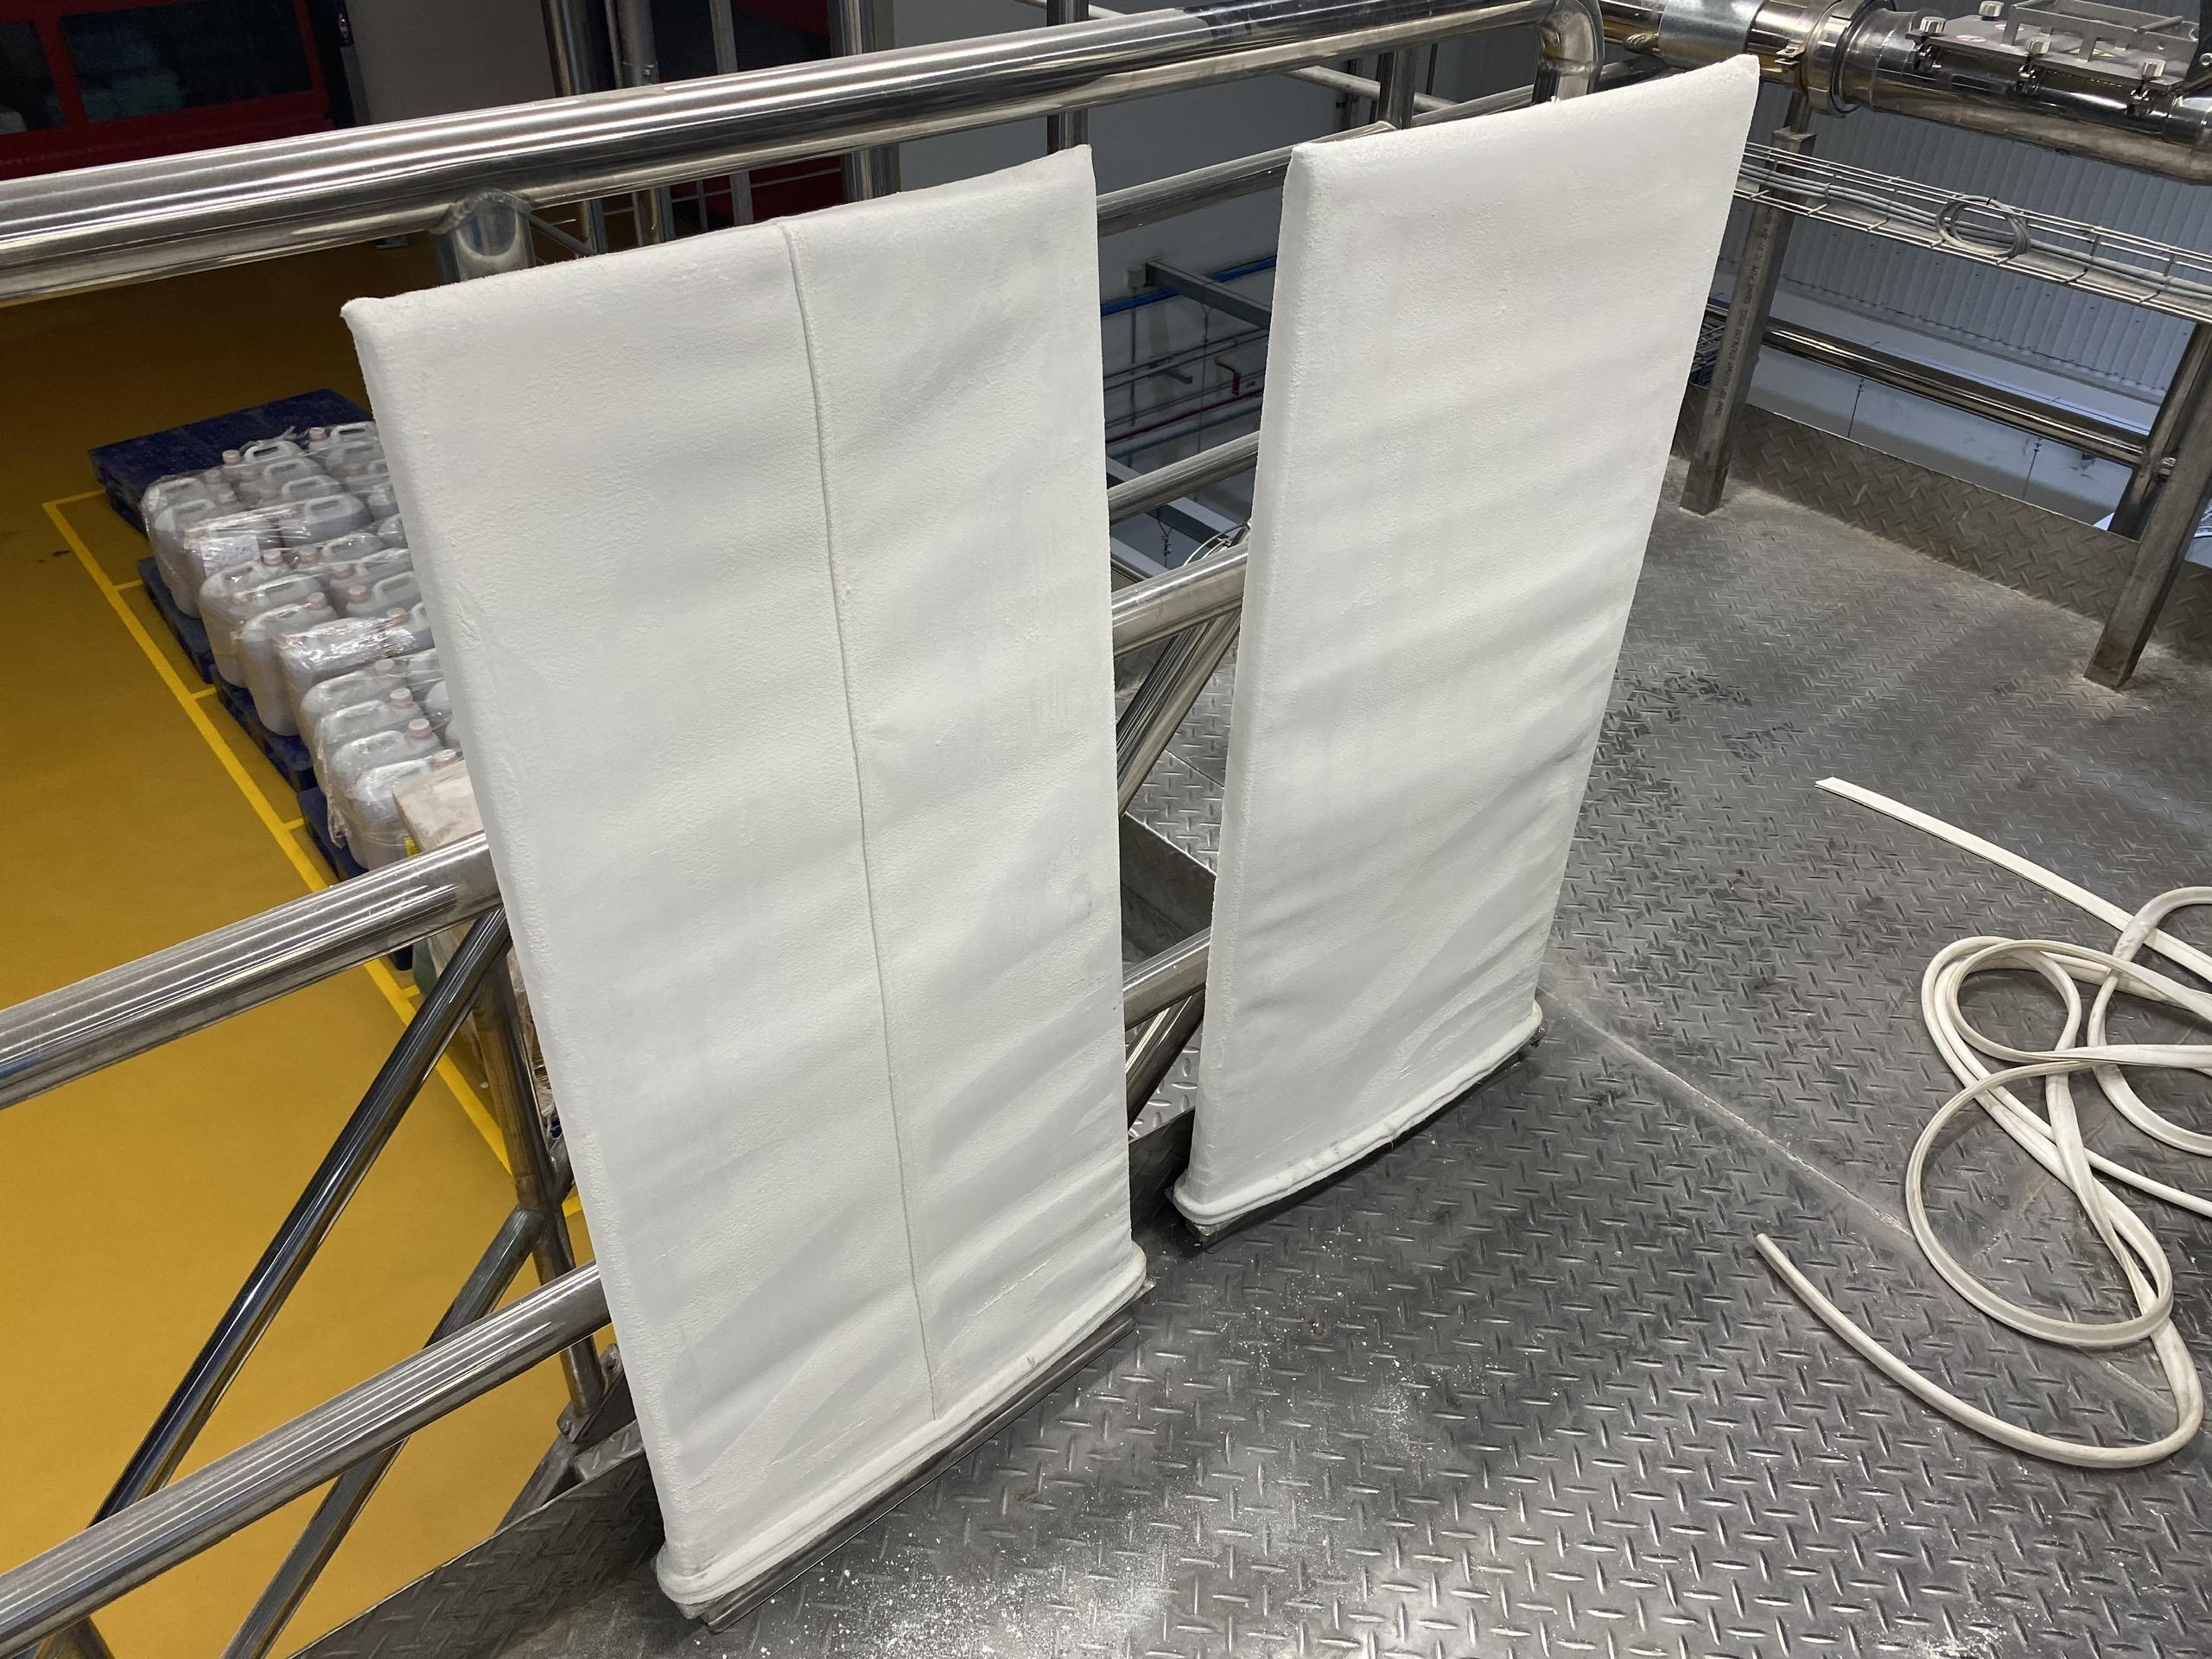 Lọc bụi kiểu túi- Filter Bag (Size :470x990mm)